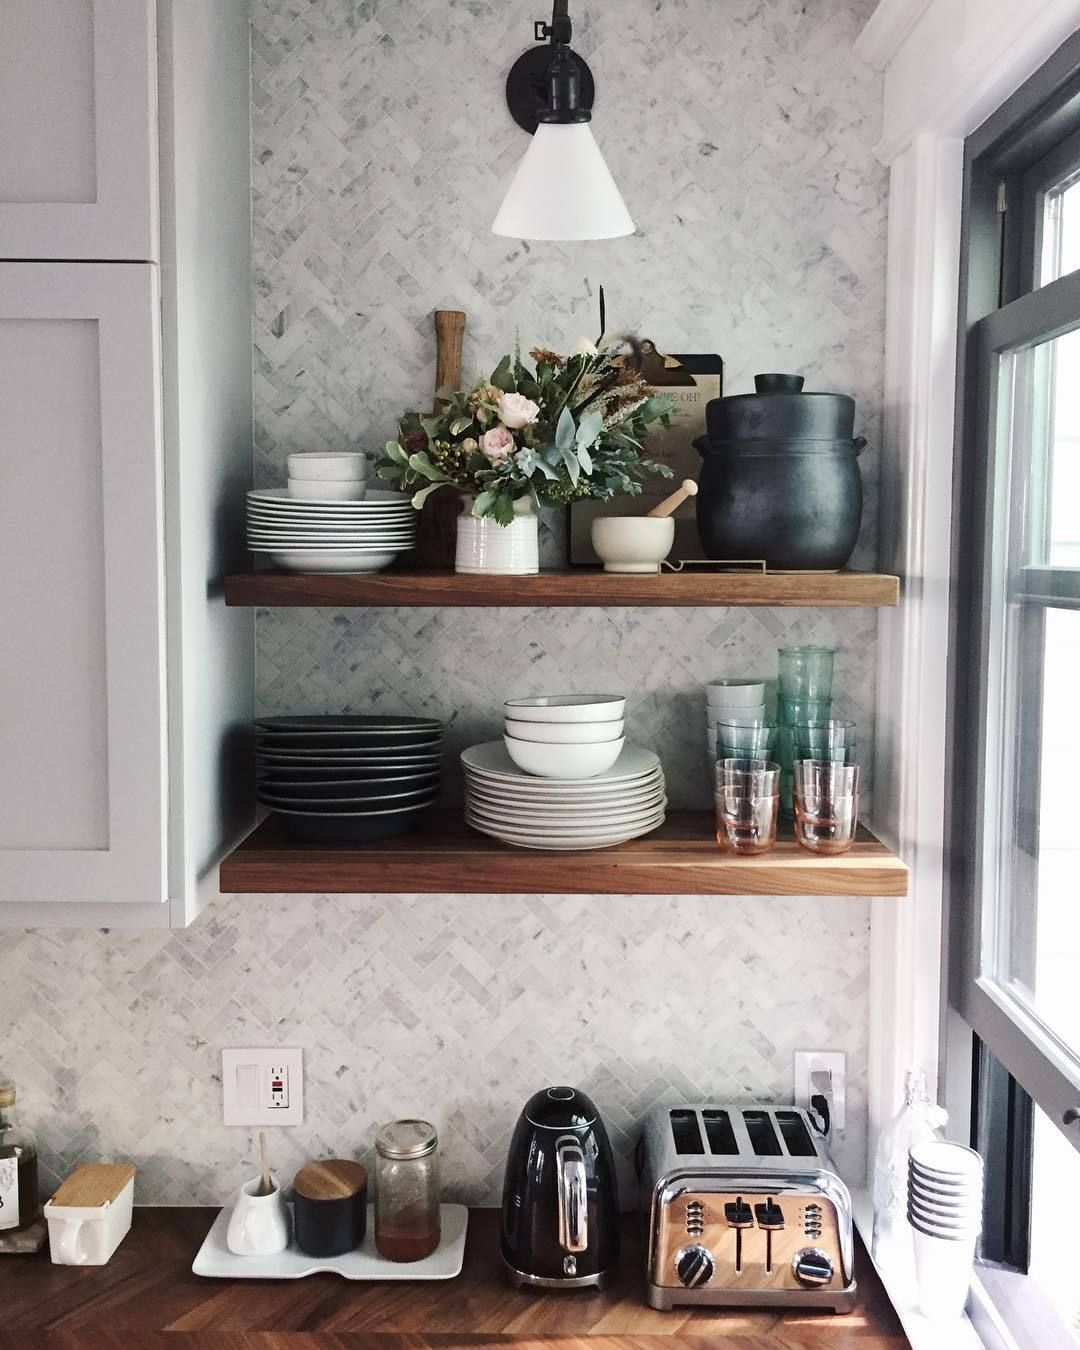 BRYN SMITH Floating shelves, Floating shelves kitchen